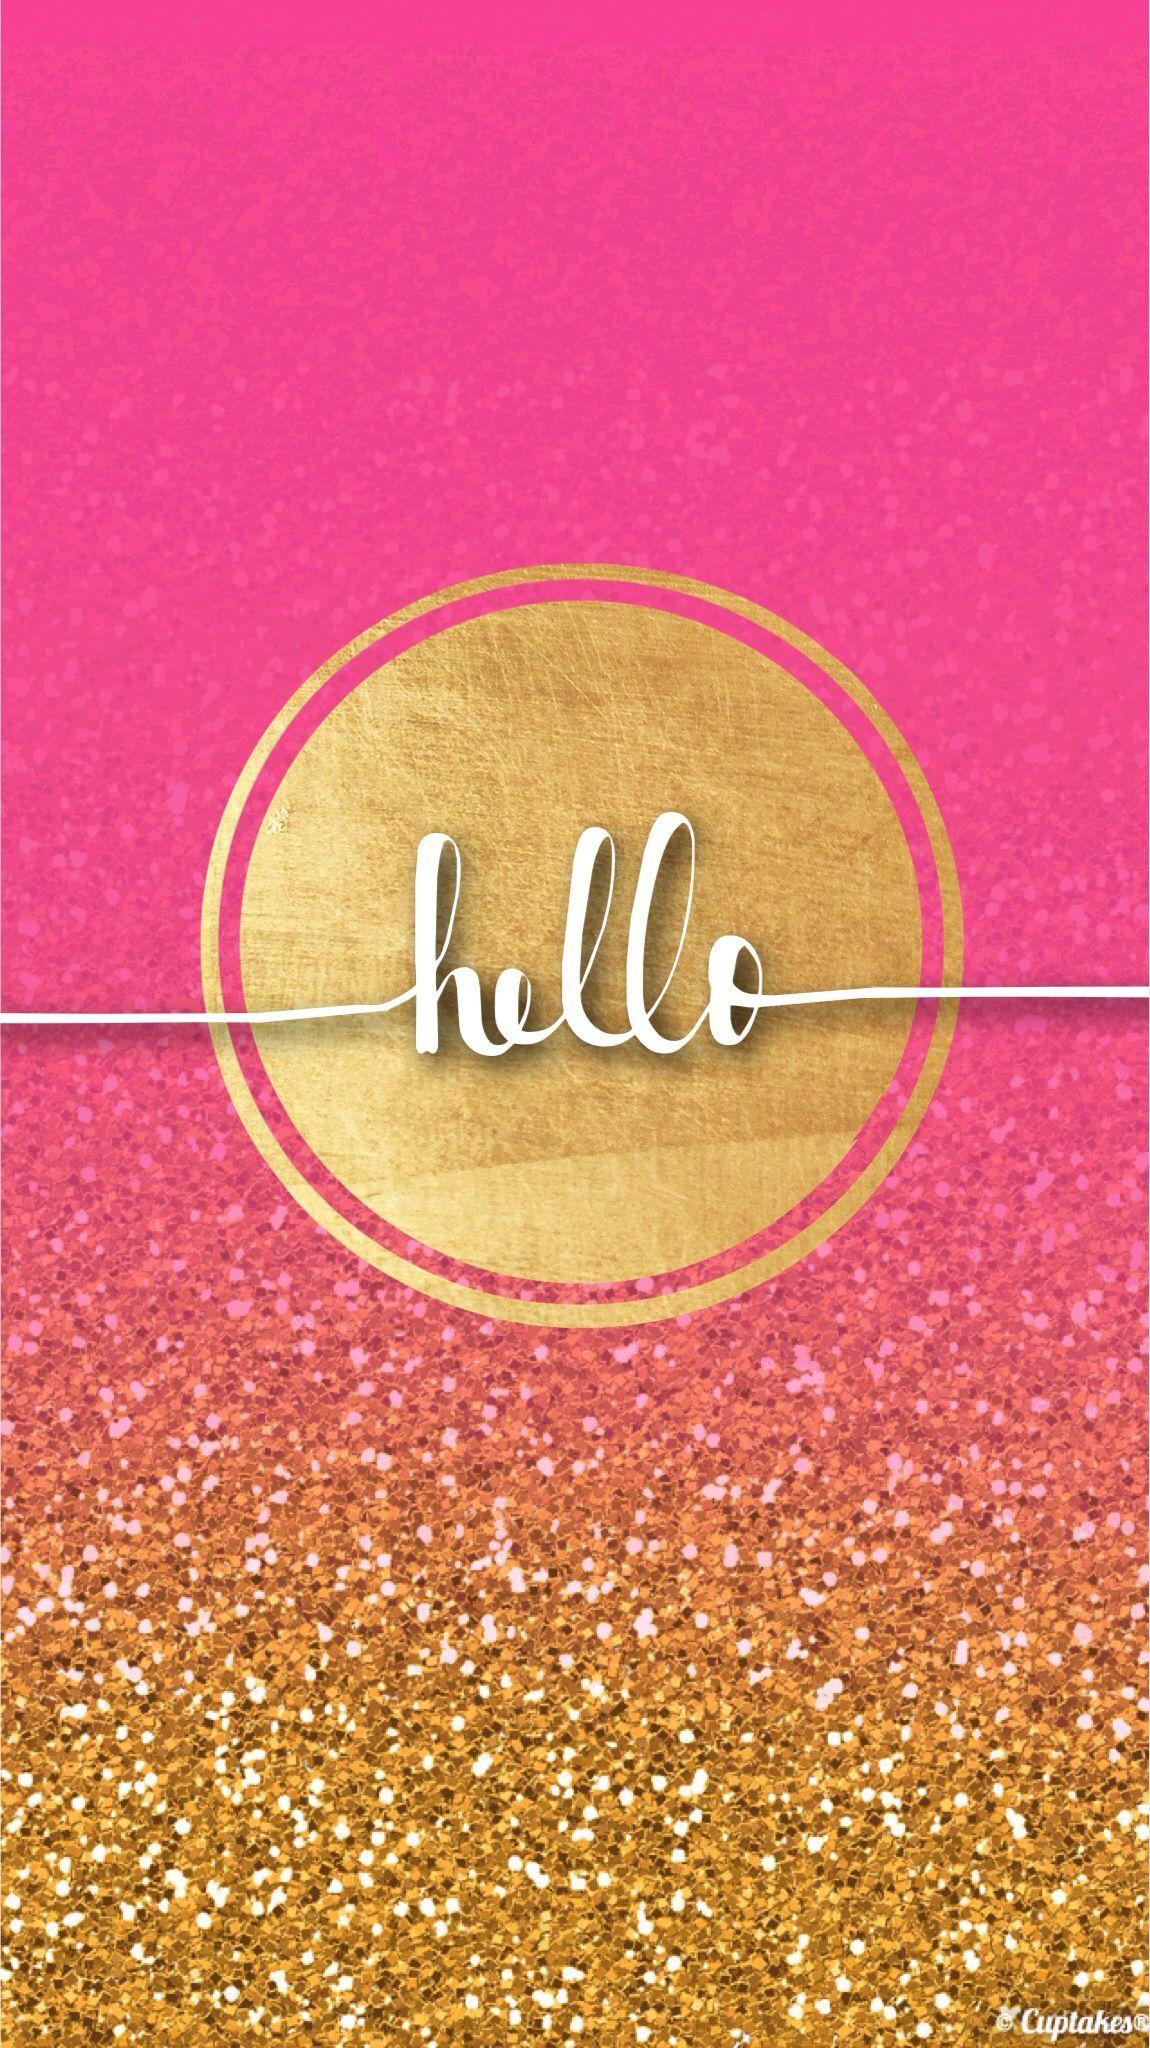 Fantastic Wallpaper Home Screen Glitter - 691cd4bf32b57395eff725e15eabb782  Pic_744743.jpg